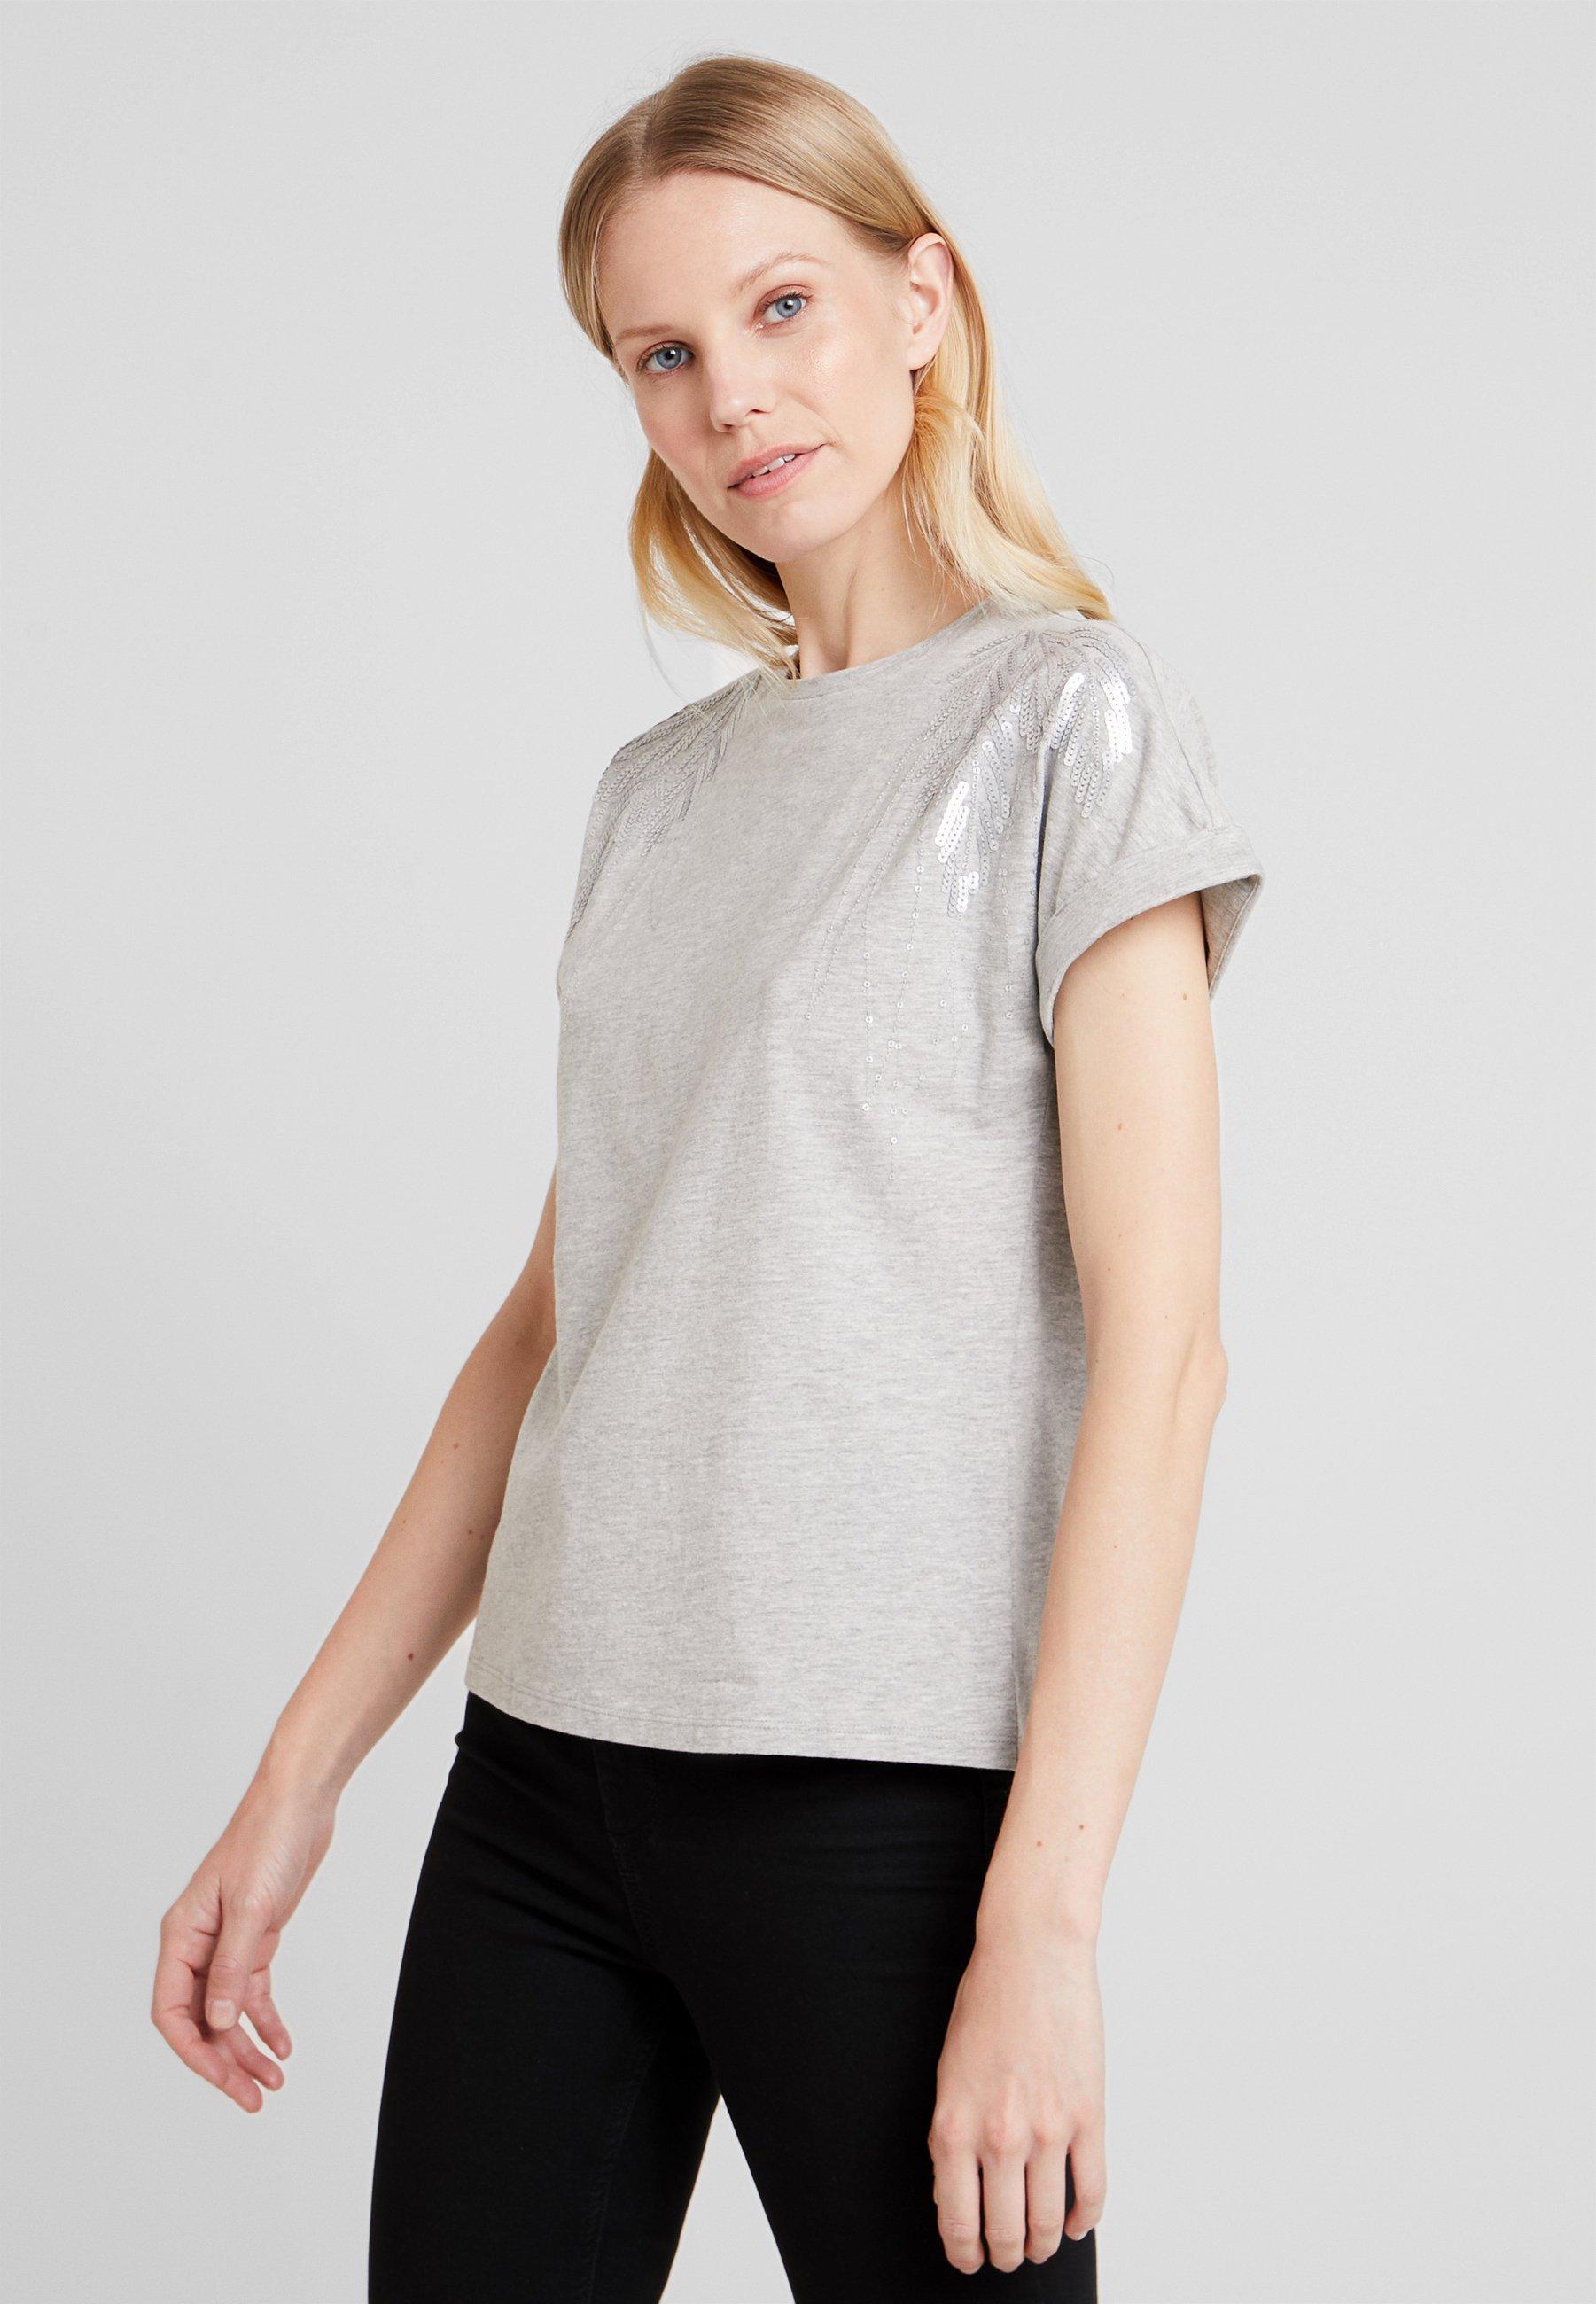 T Grey shirt Field Anna ImpriméMottled f7bI6yYgv